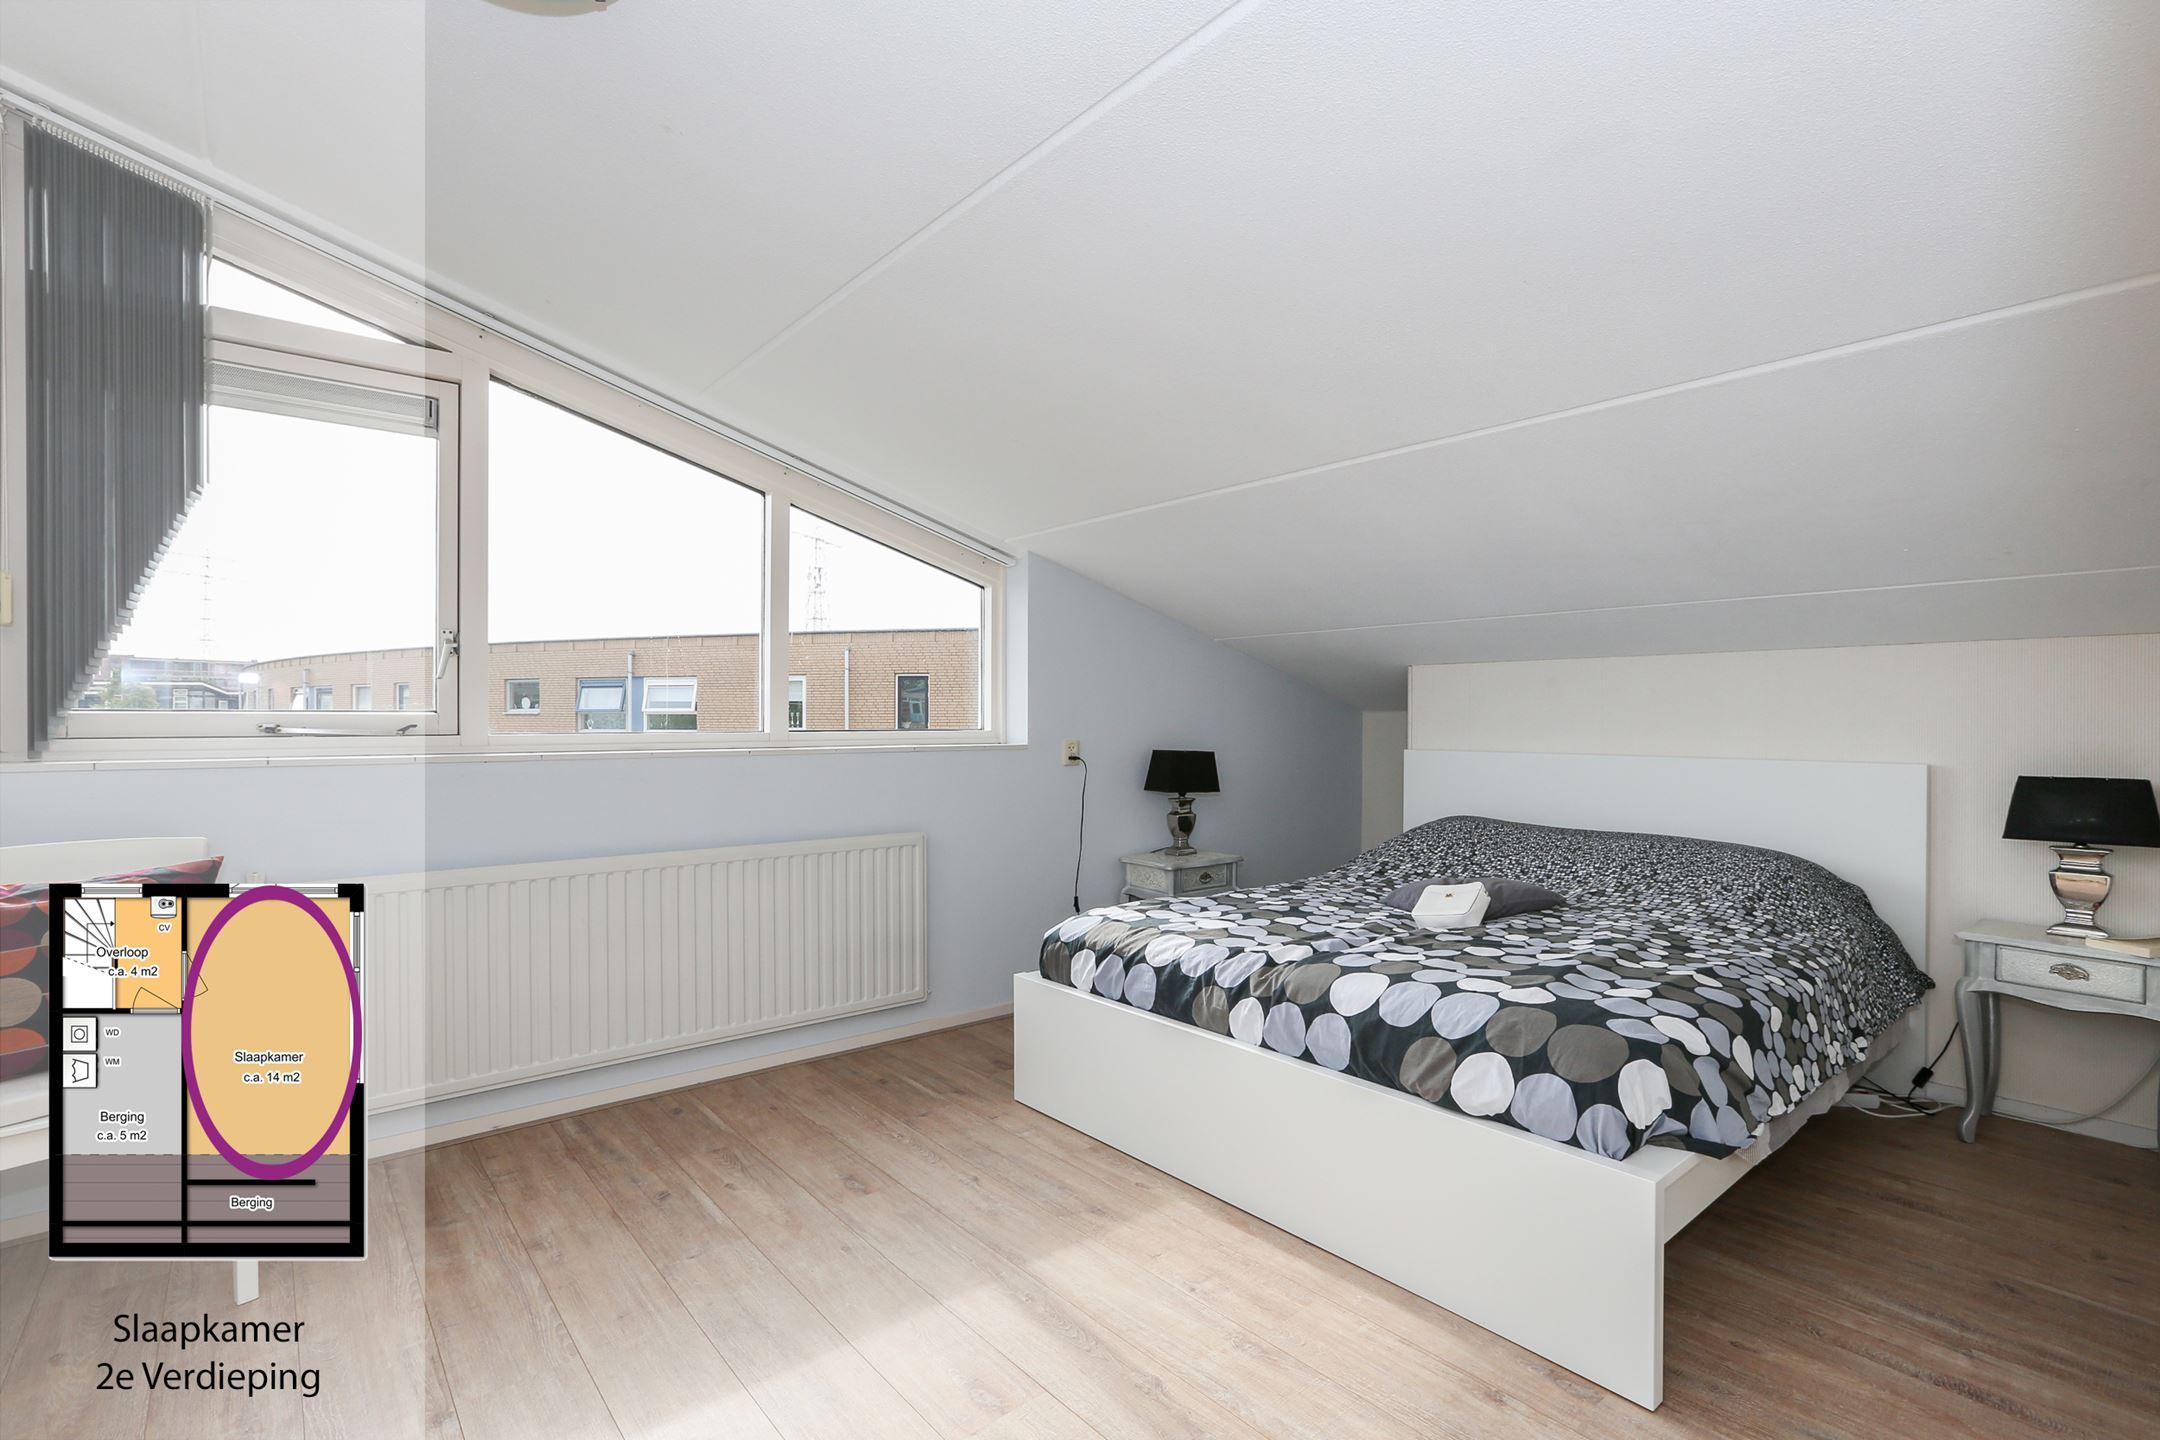 Zonwering Slaapkamer 14 : Verkocht: boeierhof 34 2162 lg lisse [funda]